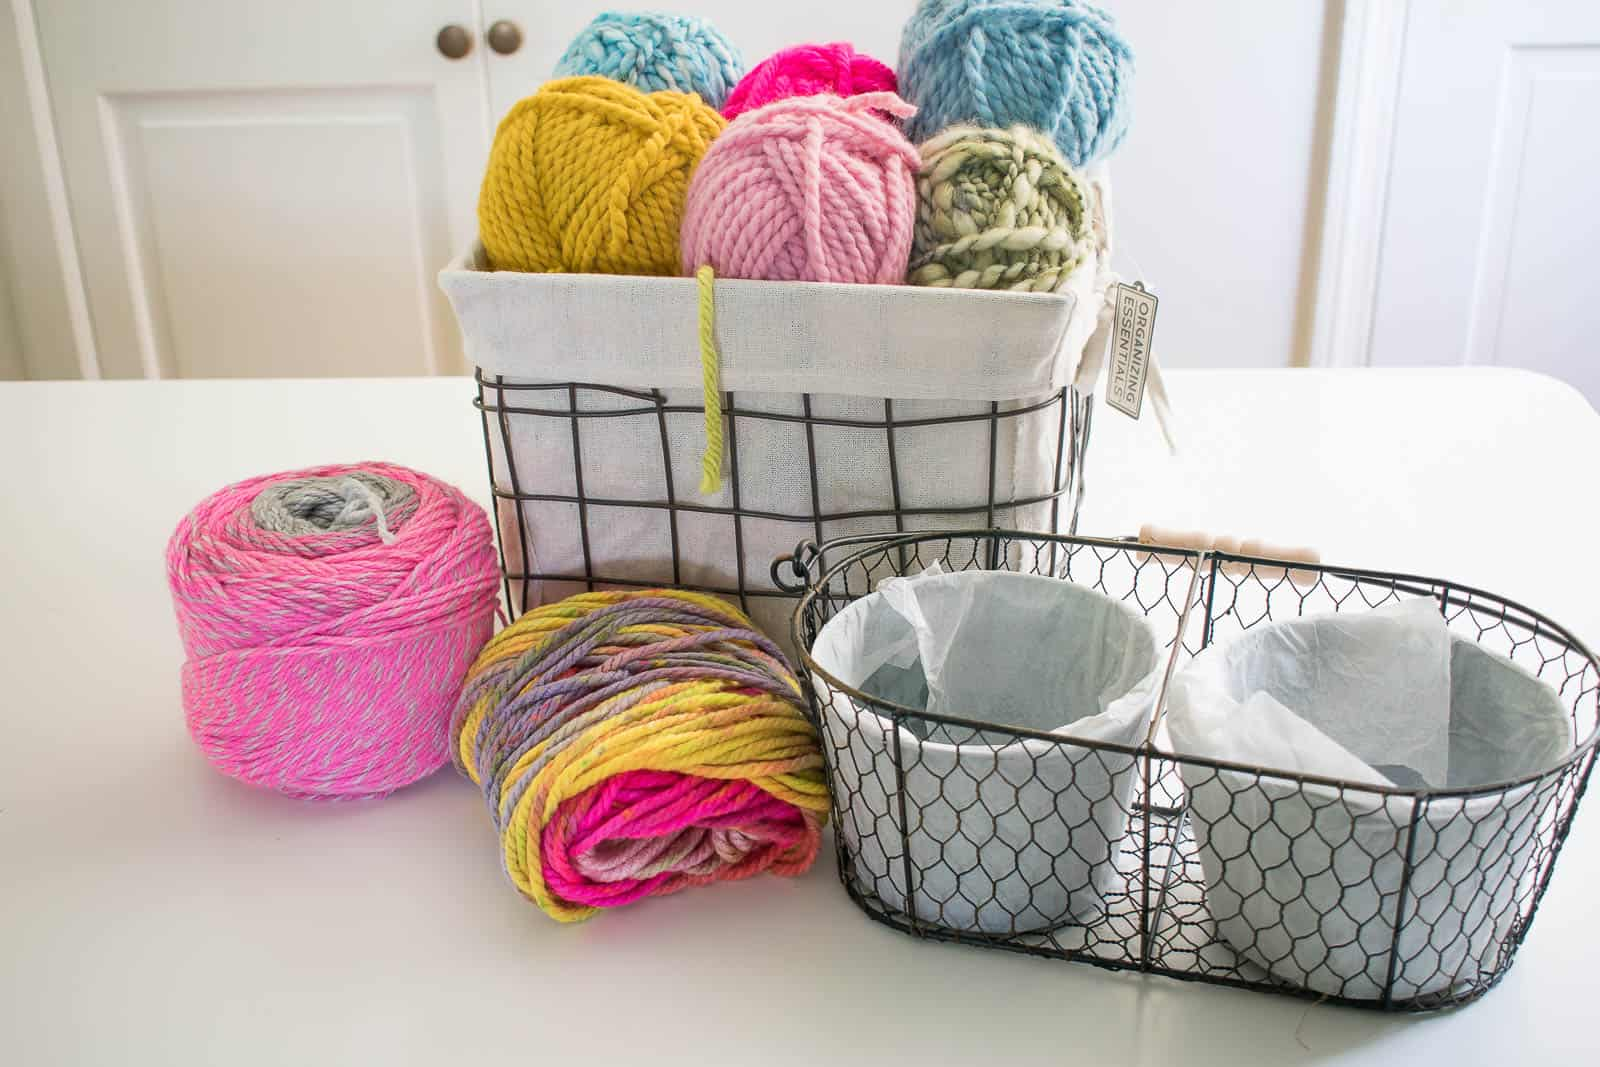 baskets with yarn